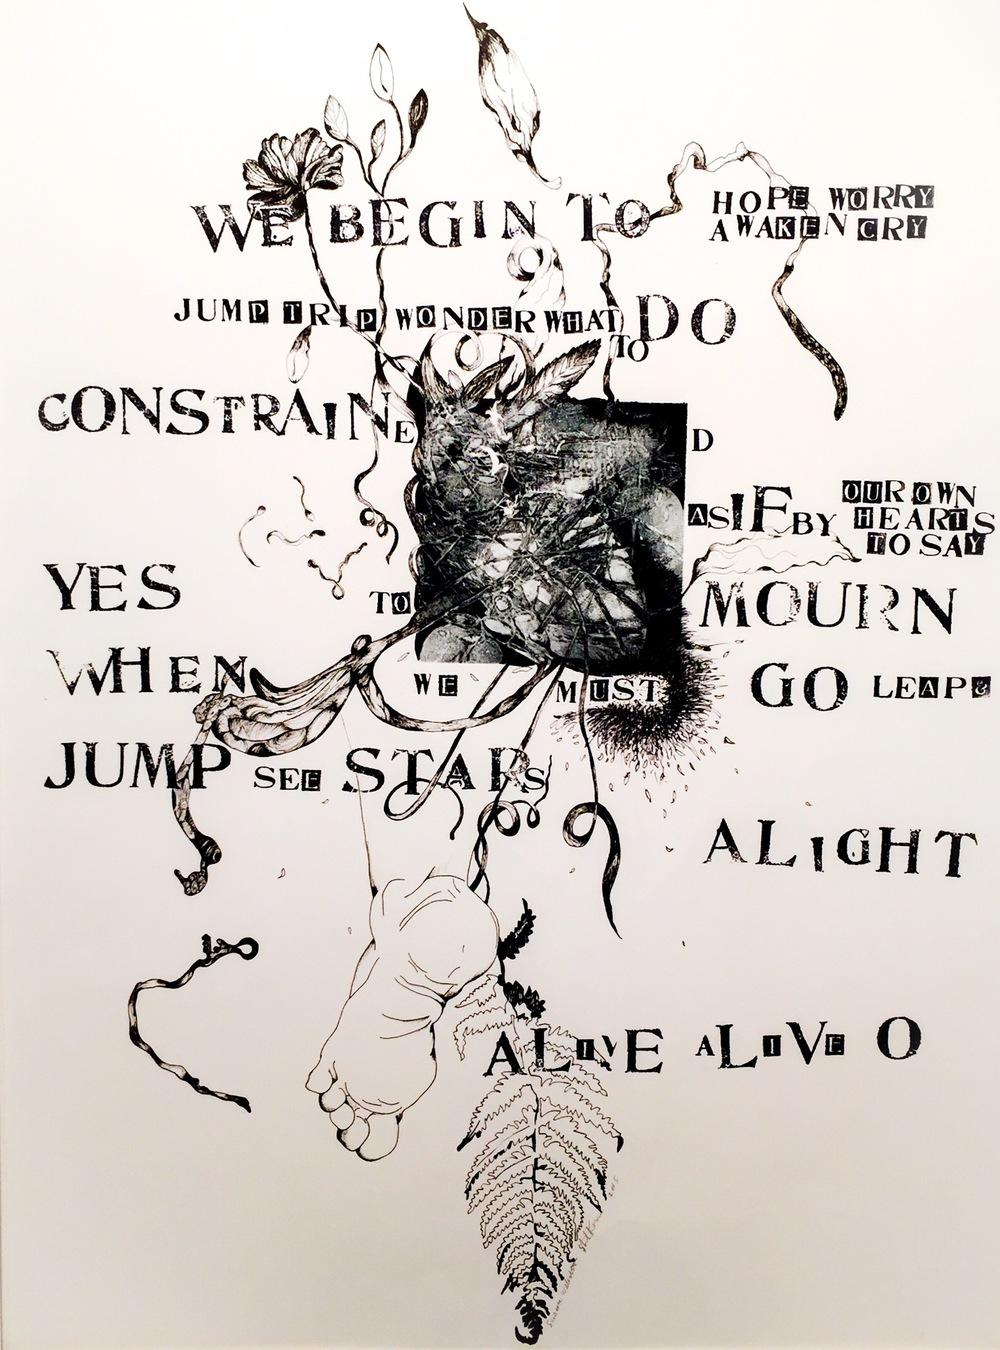 Alight   23 x 30 inches  mixed media  image: Susan Webster  hand stamped text: Stuart Kestenbaum  2015